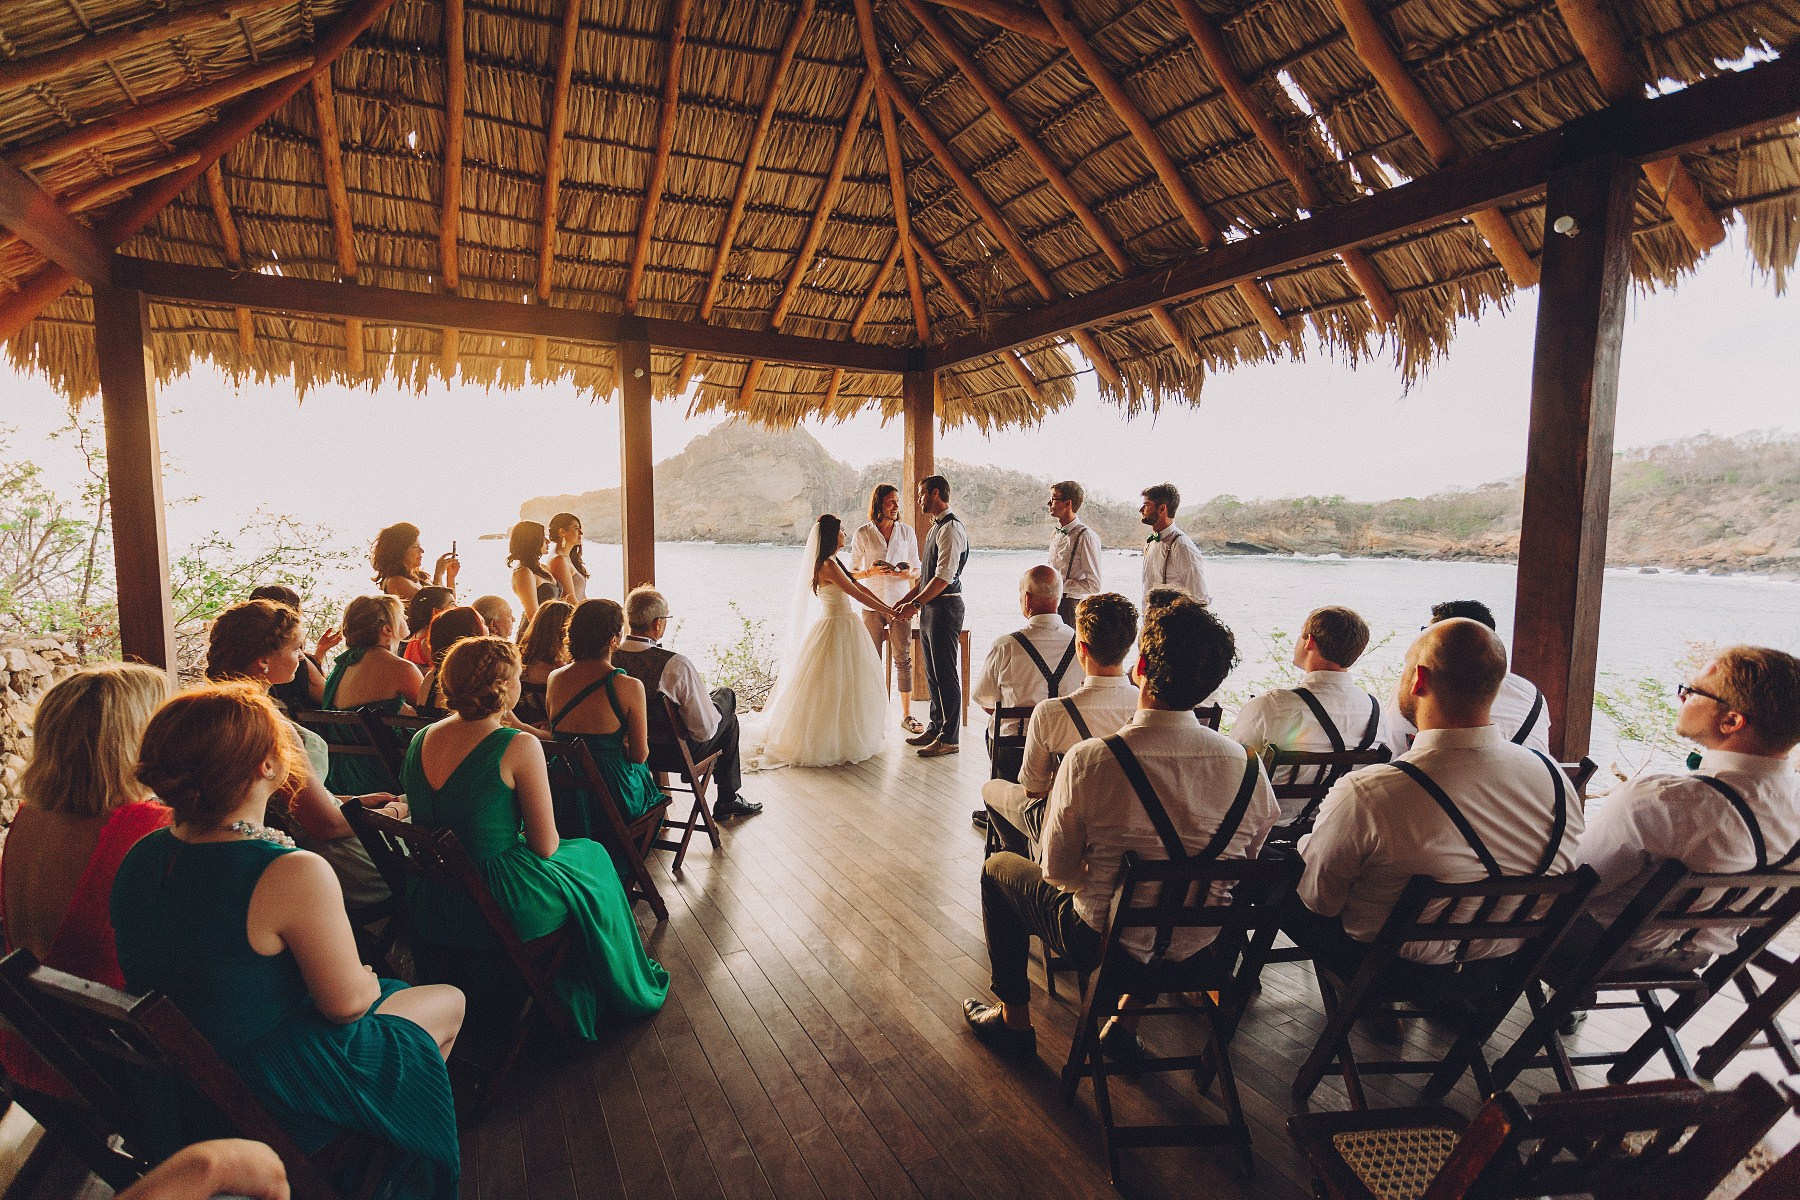 Destination Beach wedding venue in Nicaragua. Wedding photography